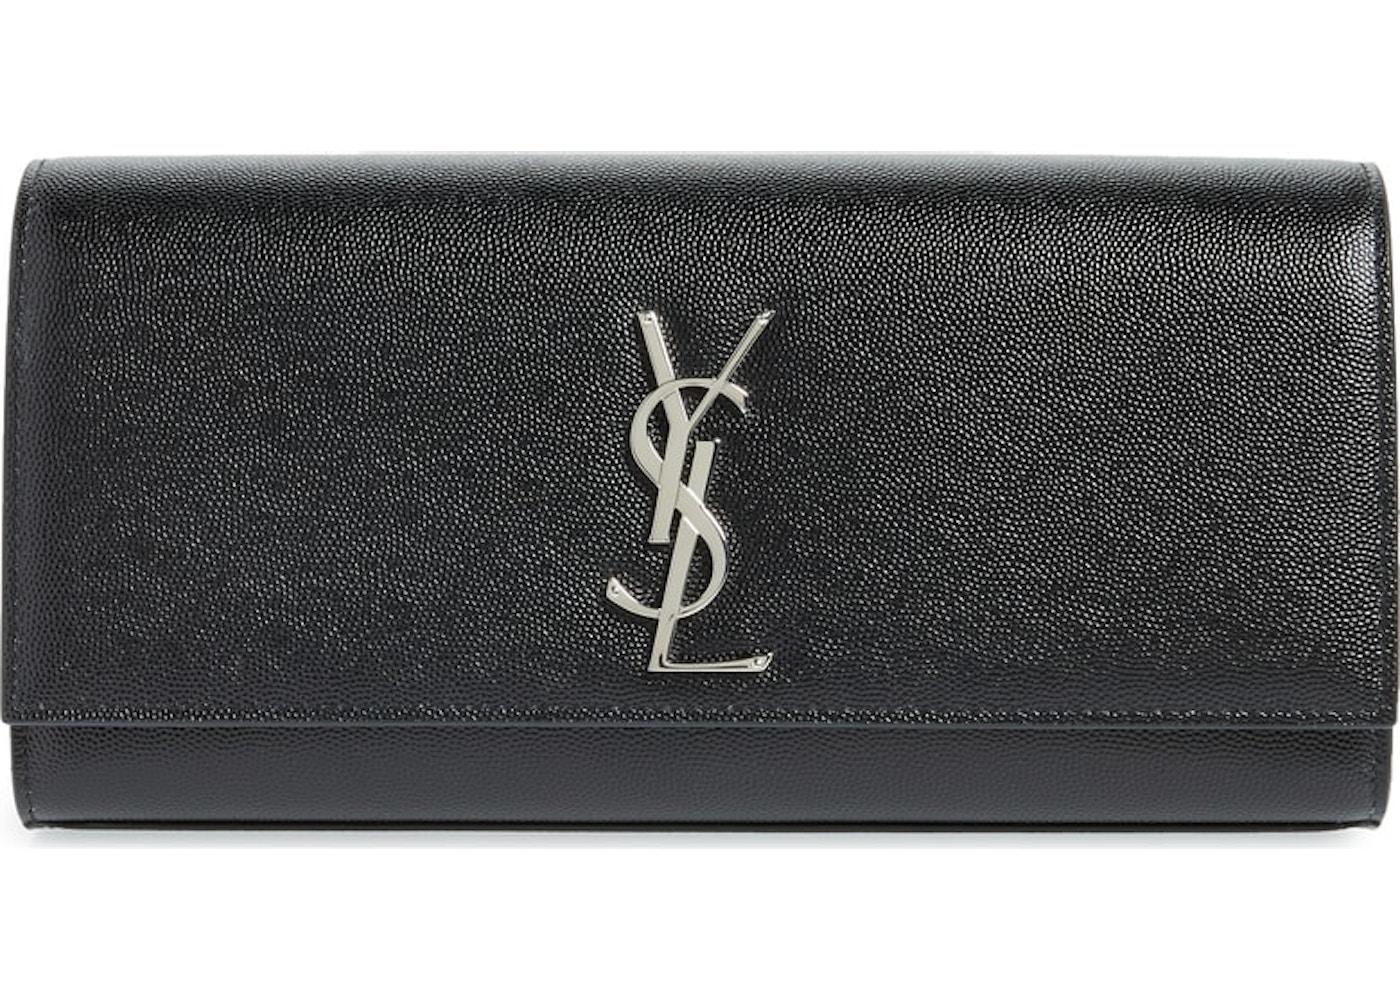 c38c3a196b13 Saint Laurent Clutch Kate YSL Silver-Tone Black